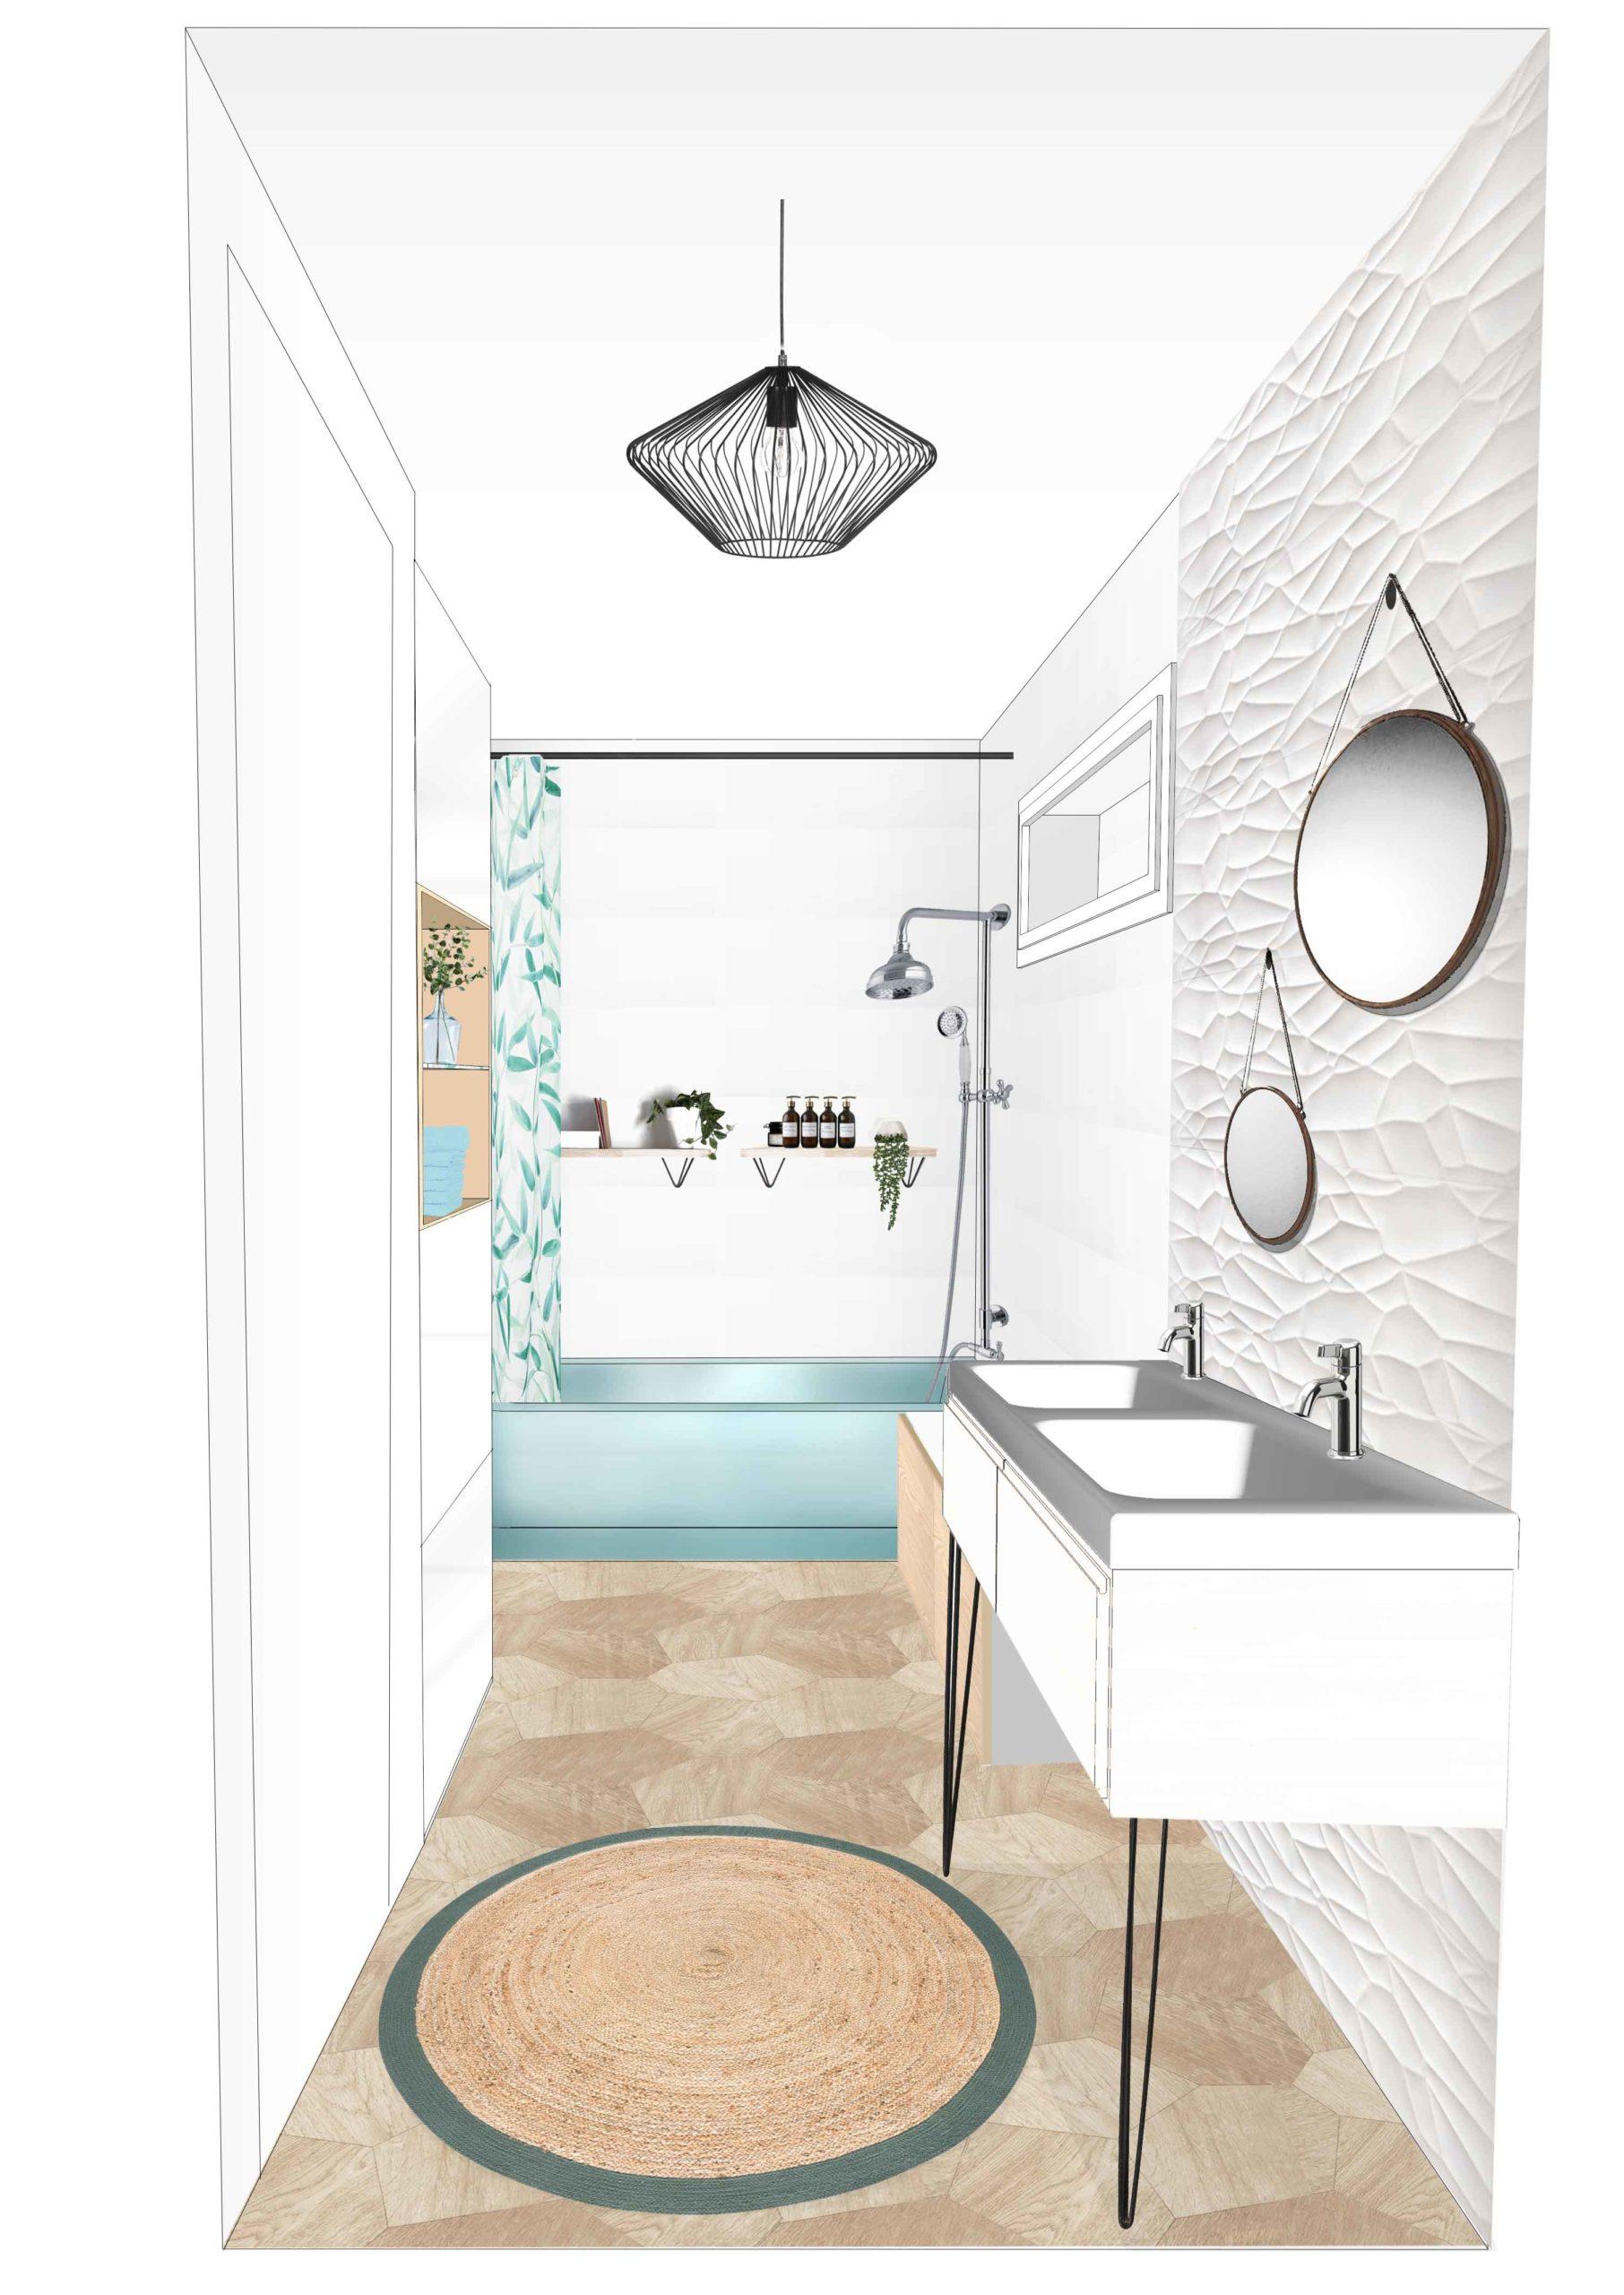 Esquisse 03 Salle de bain - relief blanc